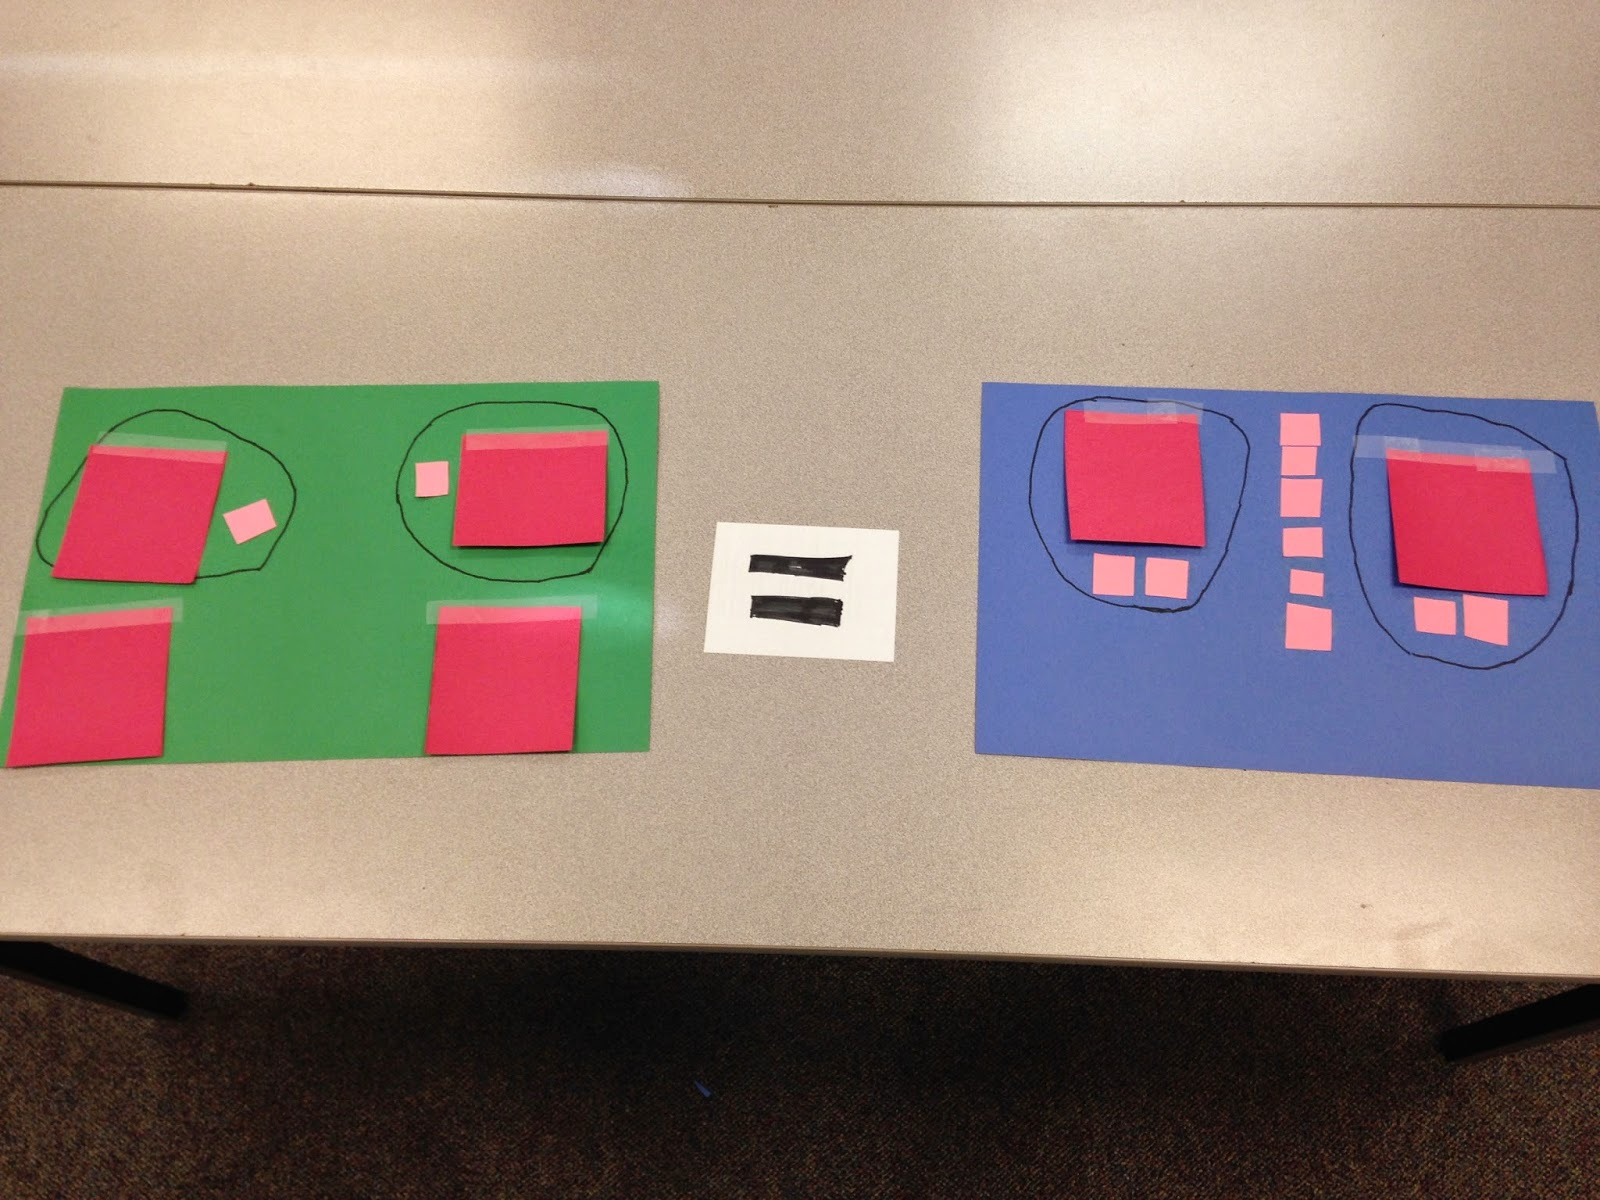 Simplifying Radicals Hidden Squares Activity